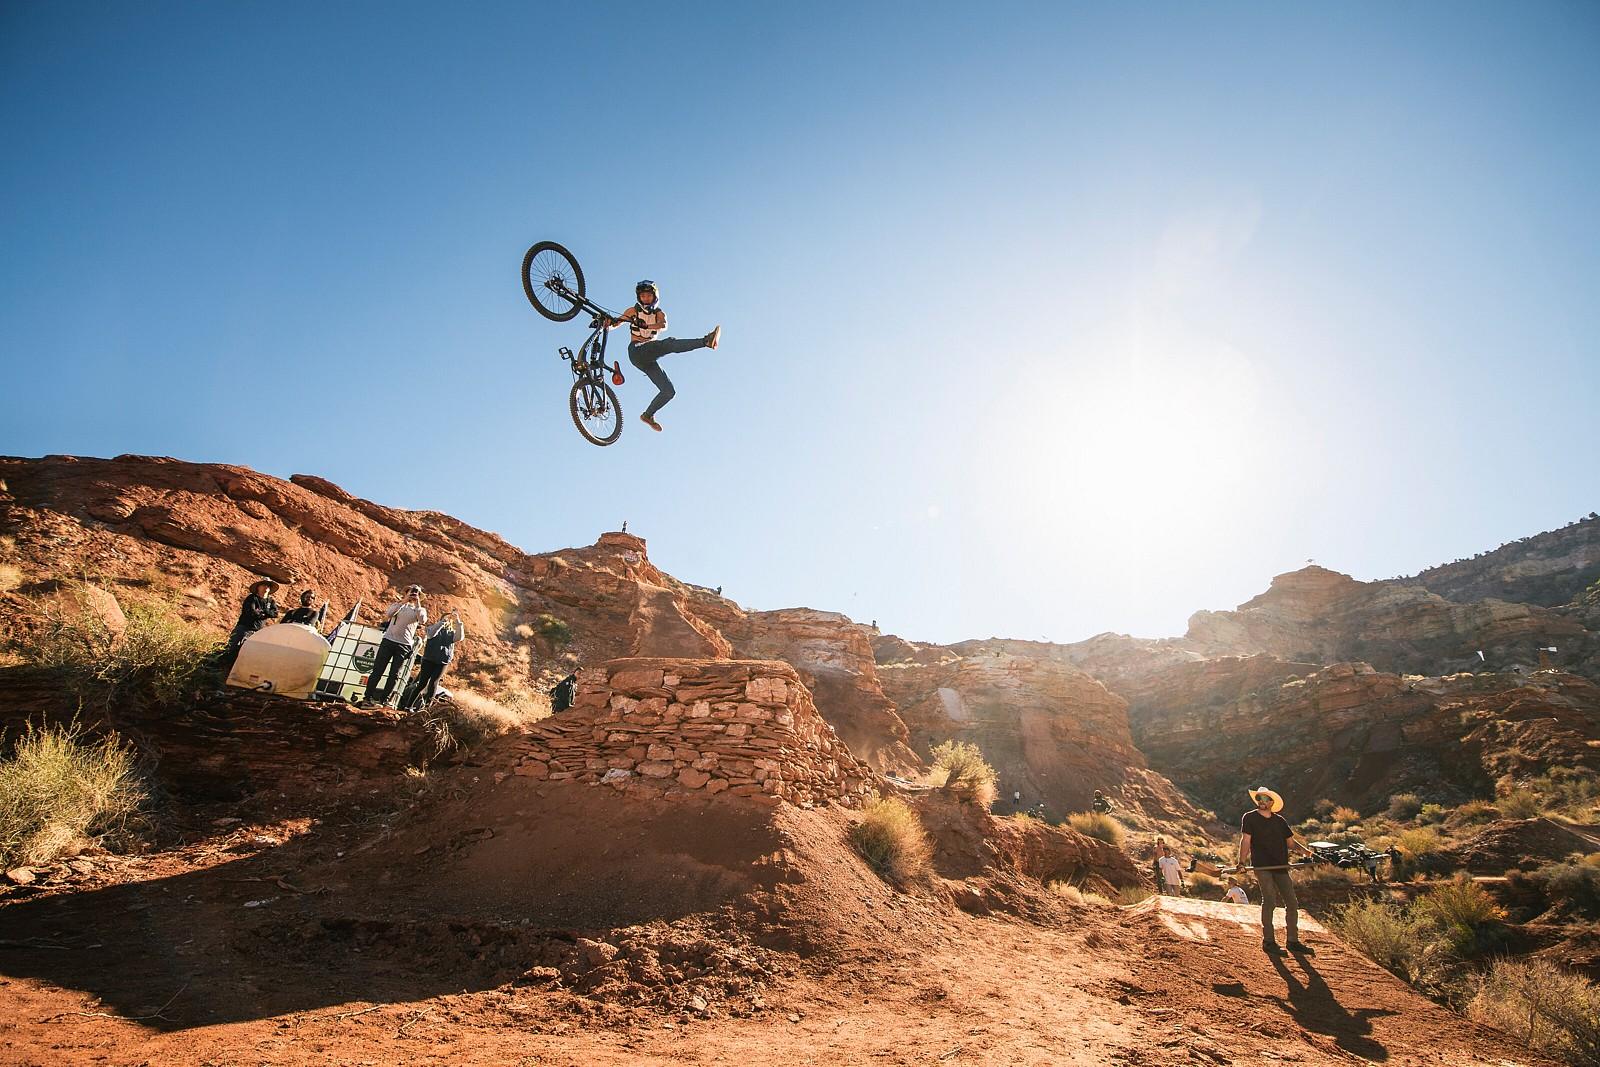 Jaxson Riddle - 2021 Red Bull Rampage Photos - Mountain Biking Pictures - Vital MTB